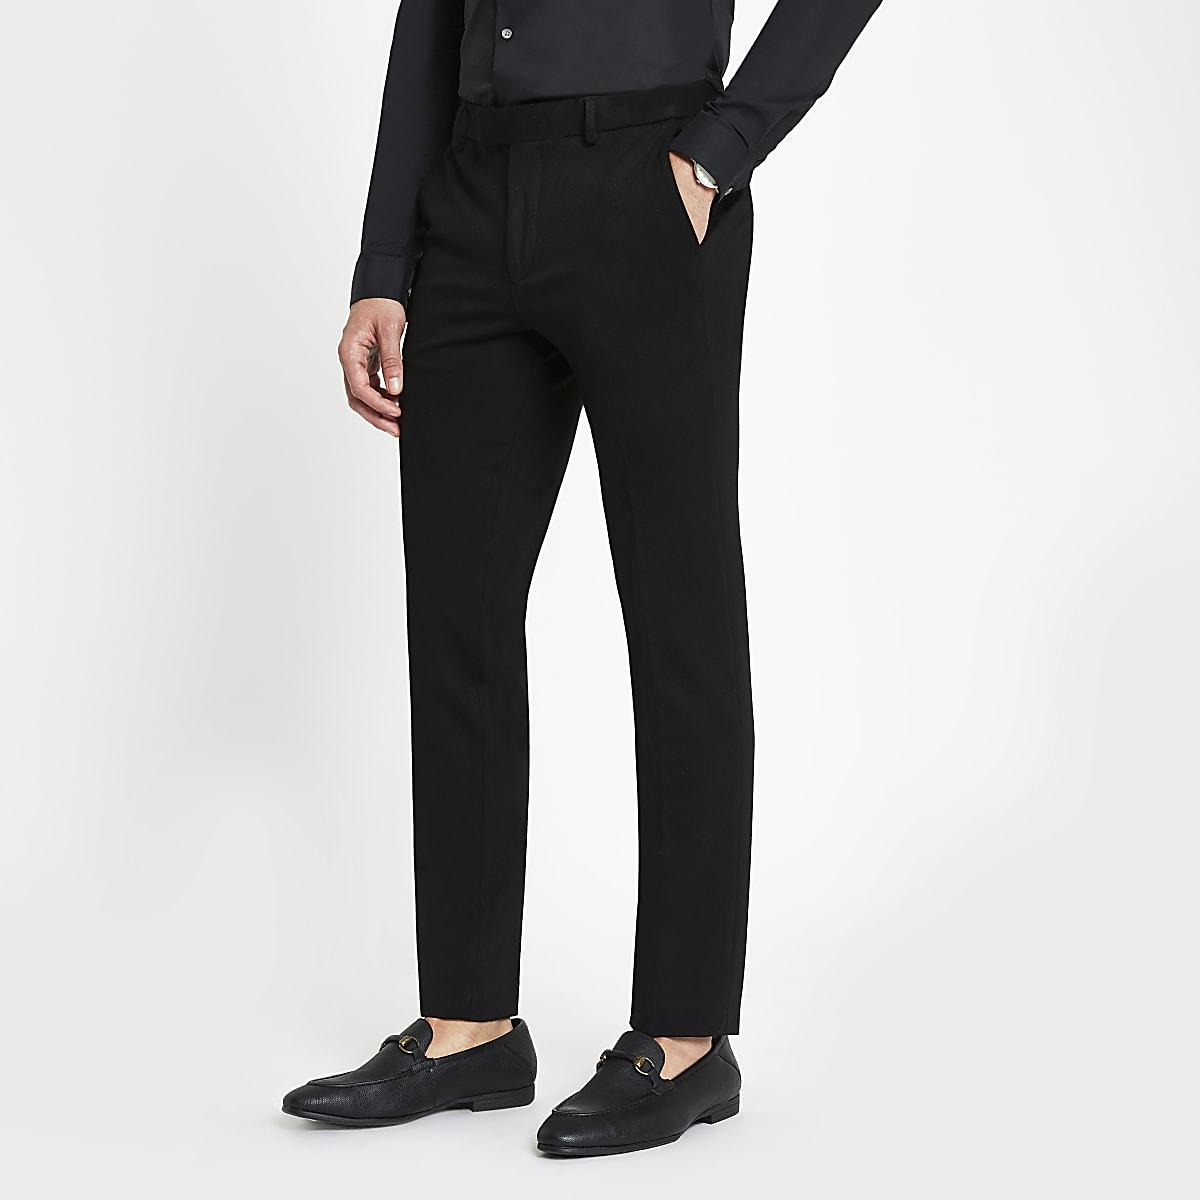 Zwarte superskinny pantalon